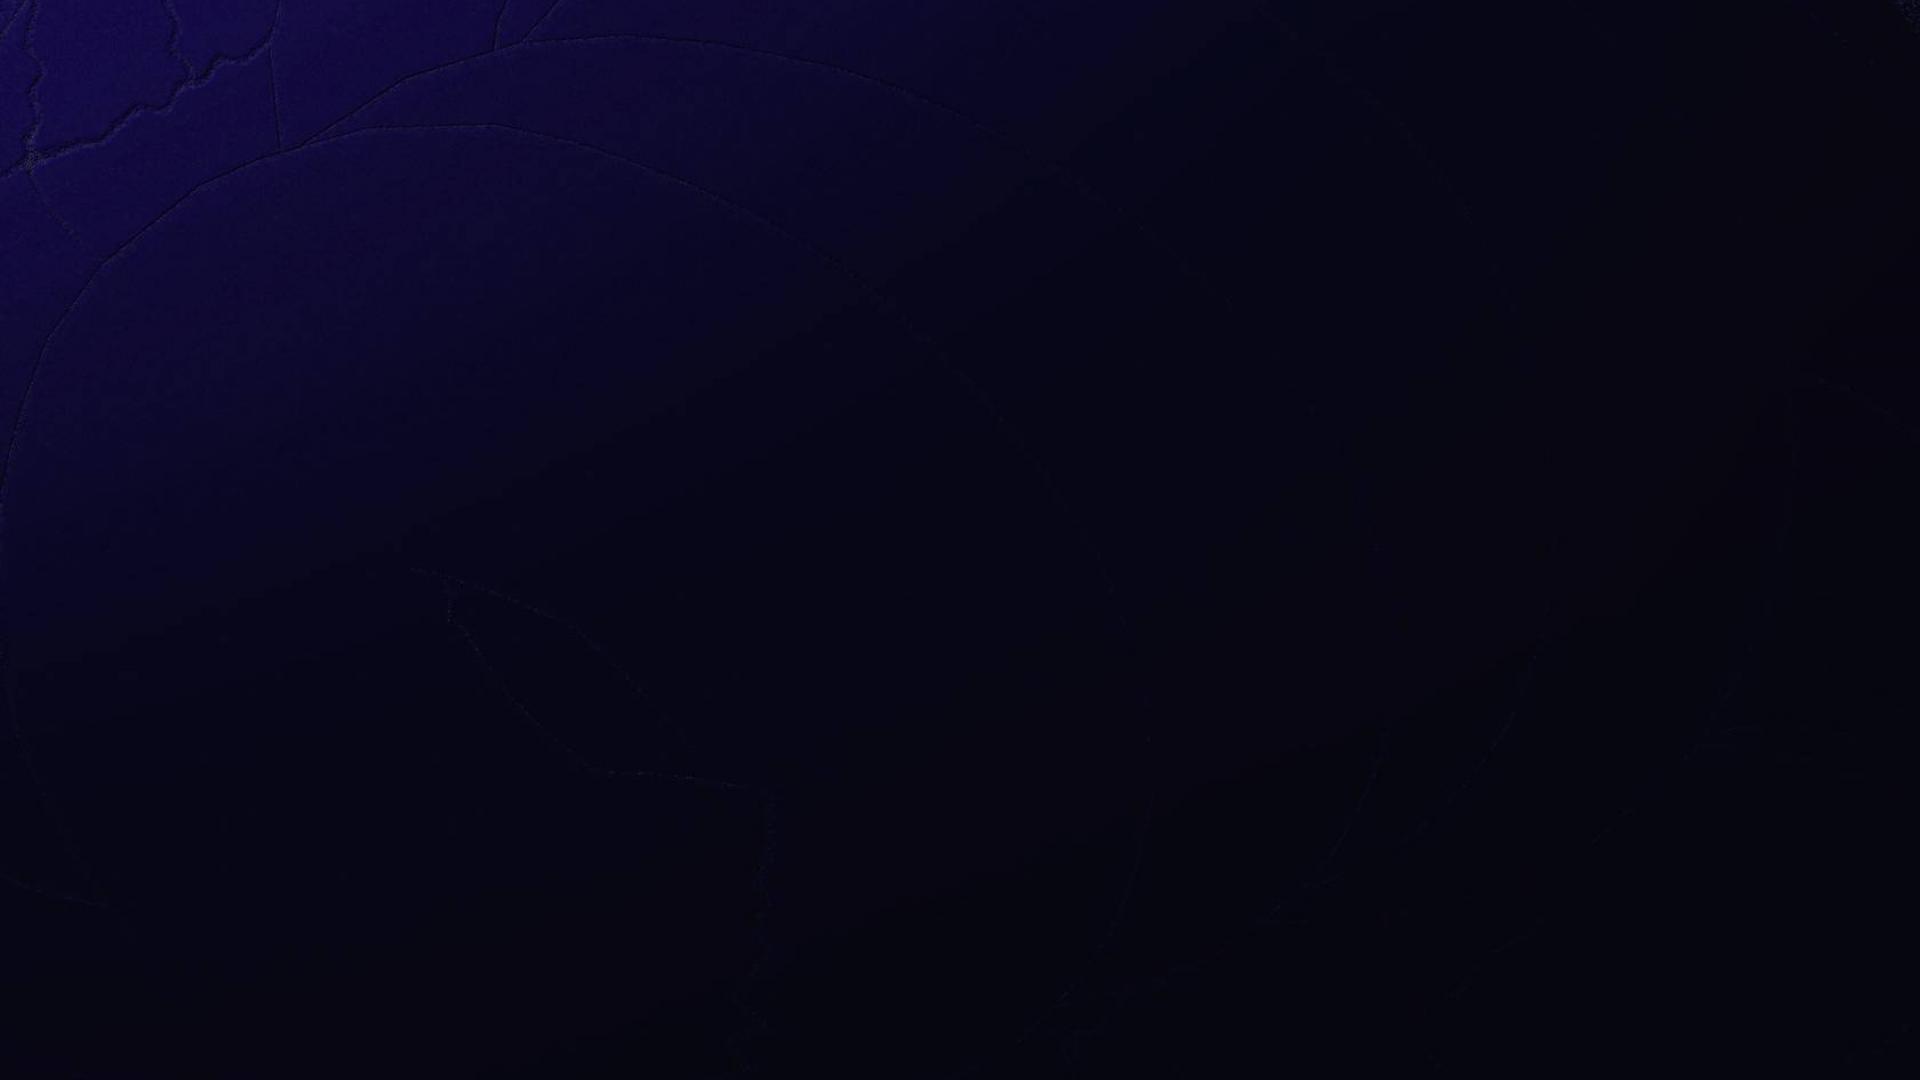 Dark Blue Wallpapers Group 80